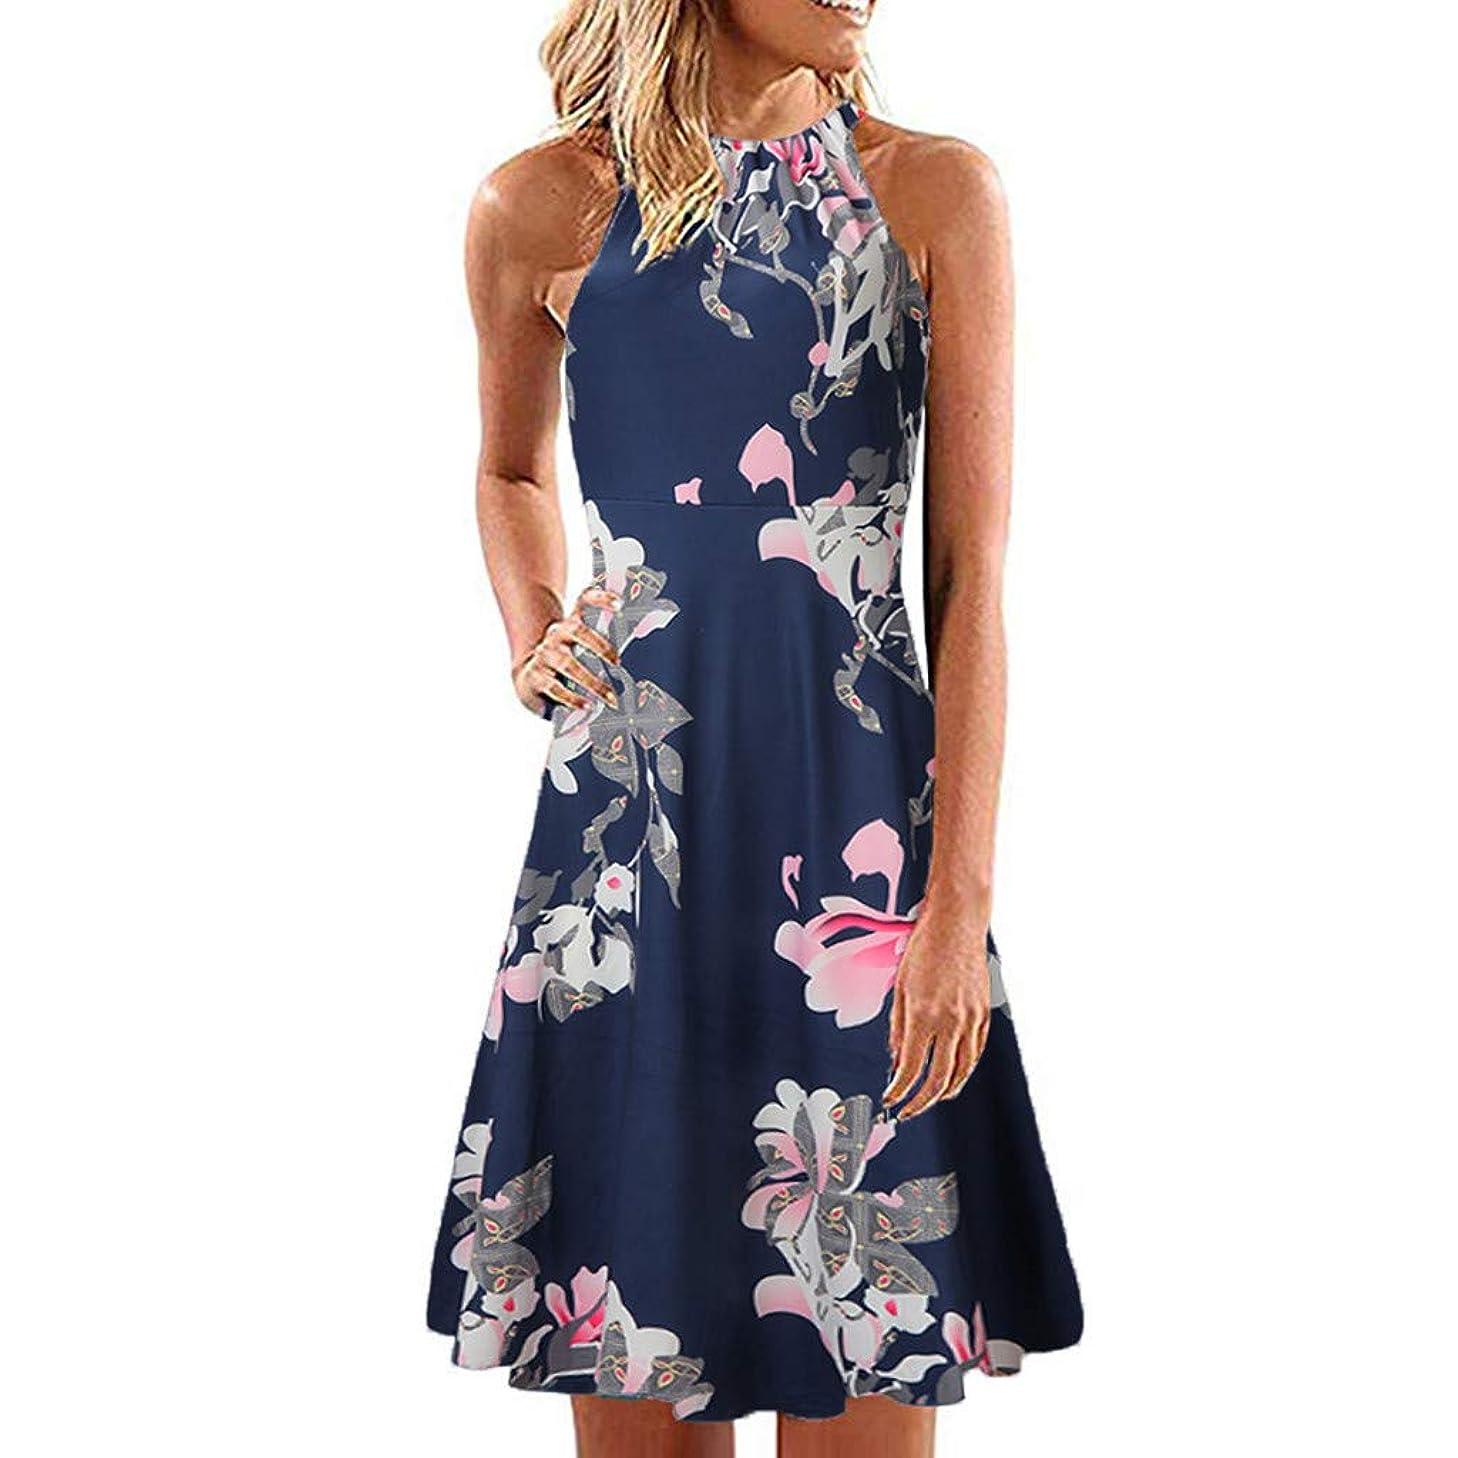 ?HebeTop? Women's Floral Maxi Dresses Boho V Neck Split Beach Party Dress